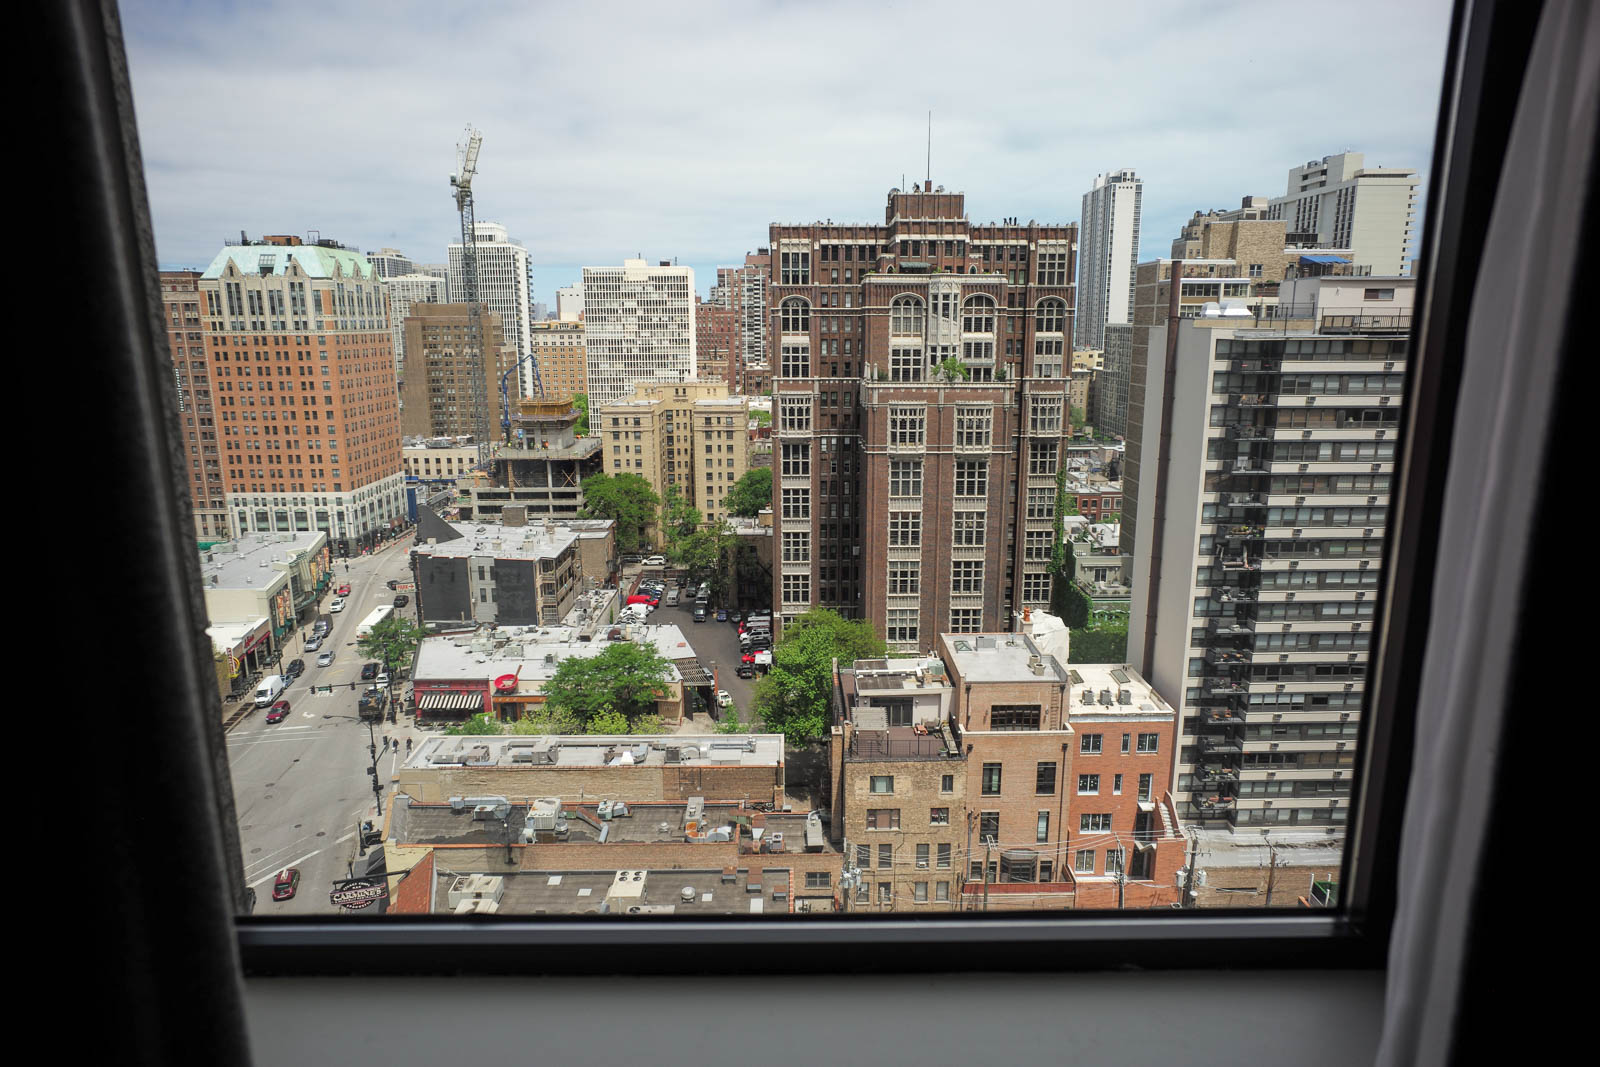 Room 1607, Thompson Hotel, Chicago